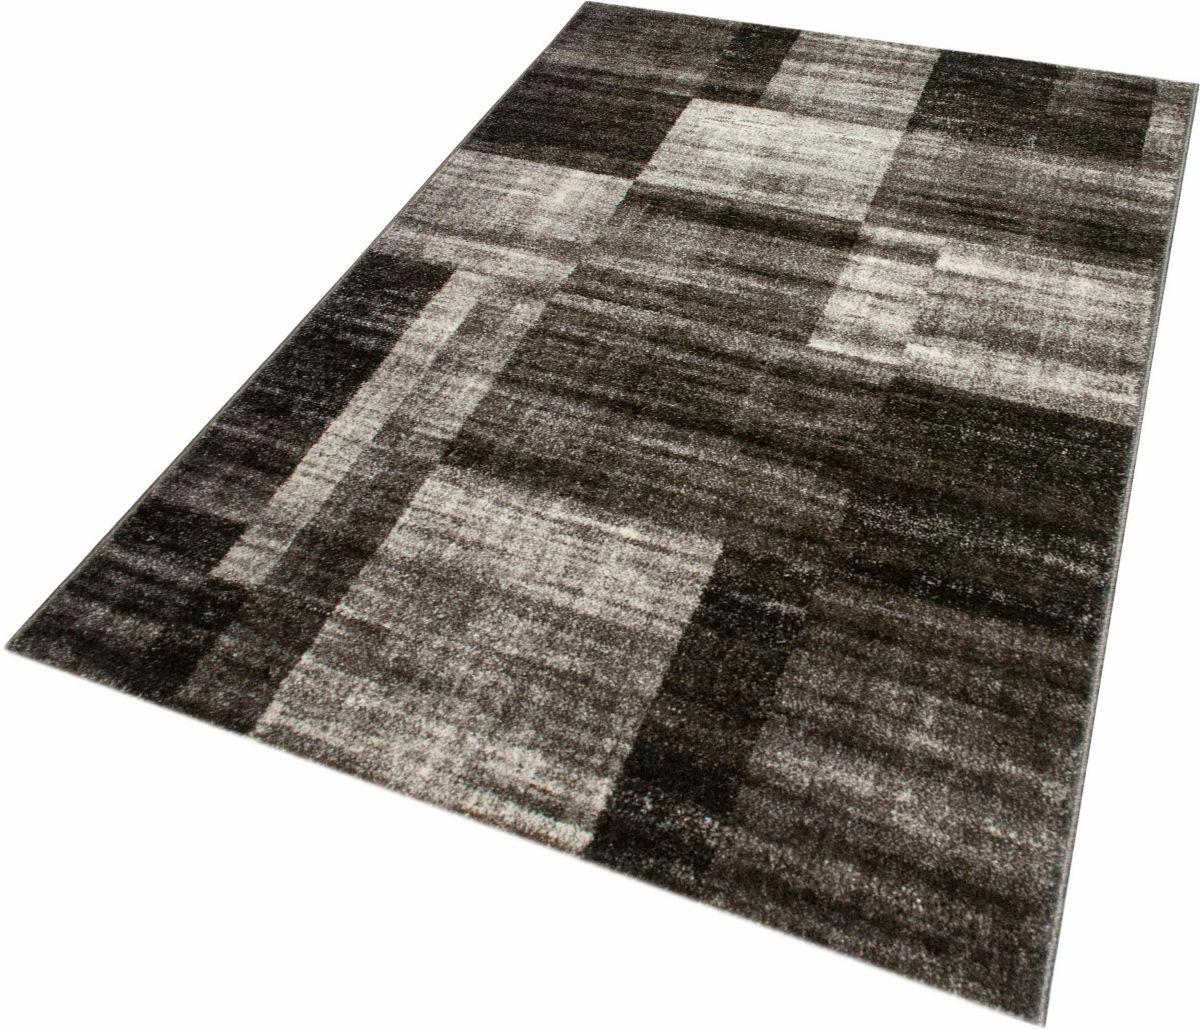 Teppich, »Pienza 11580«, Festival, rechteckig, Höhe 9 mm, maschinell gewebt